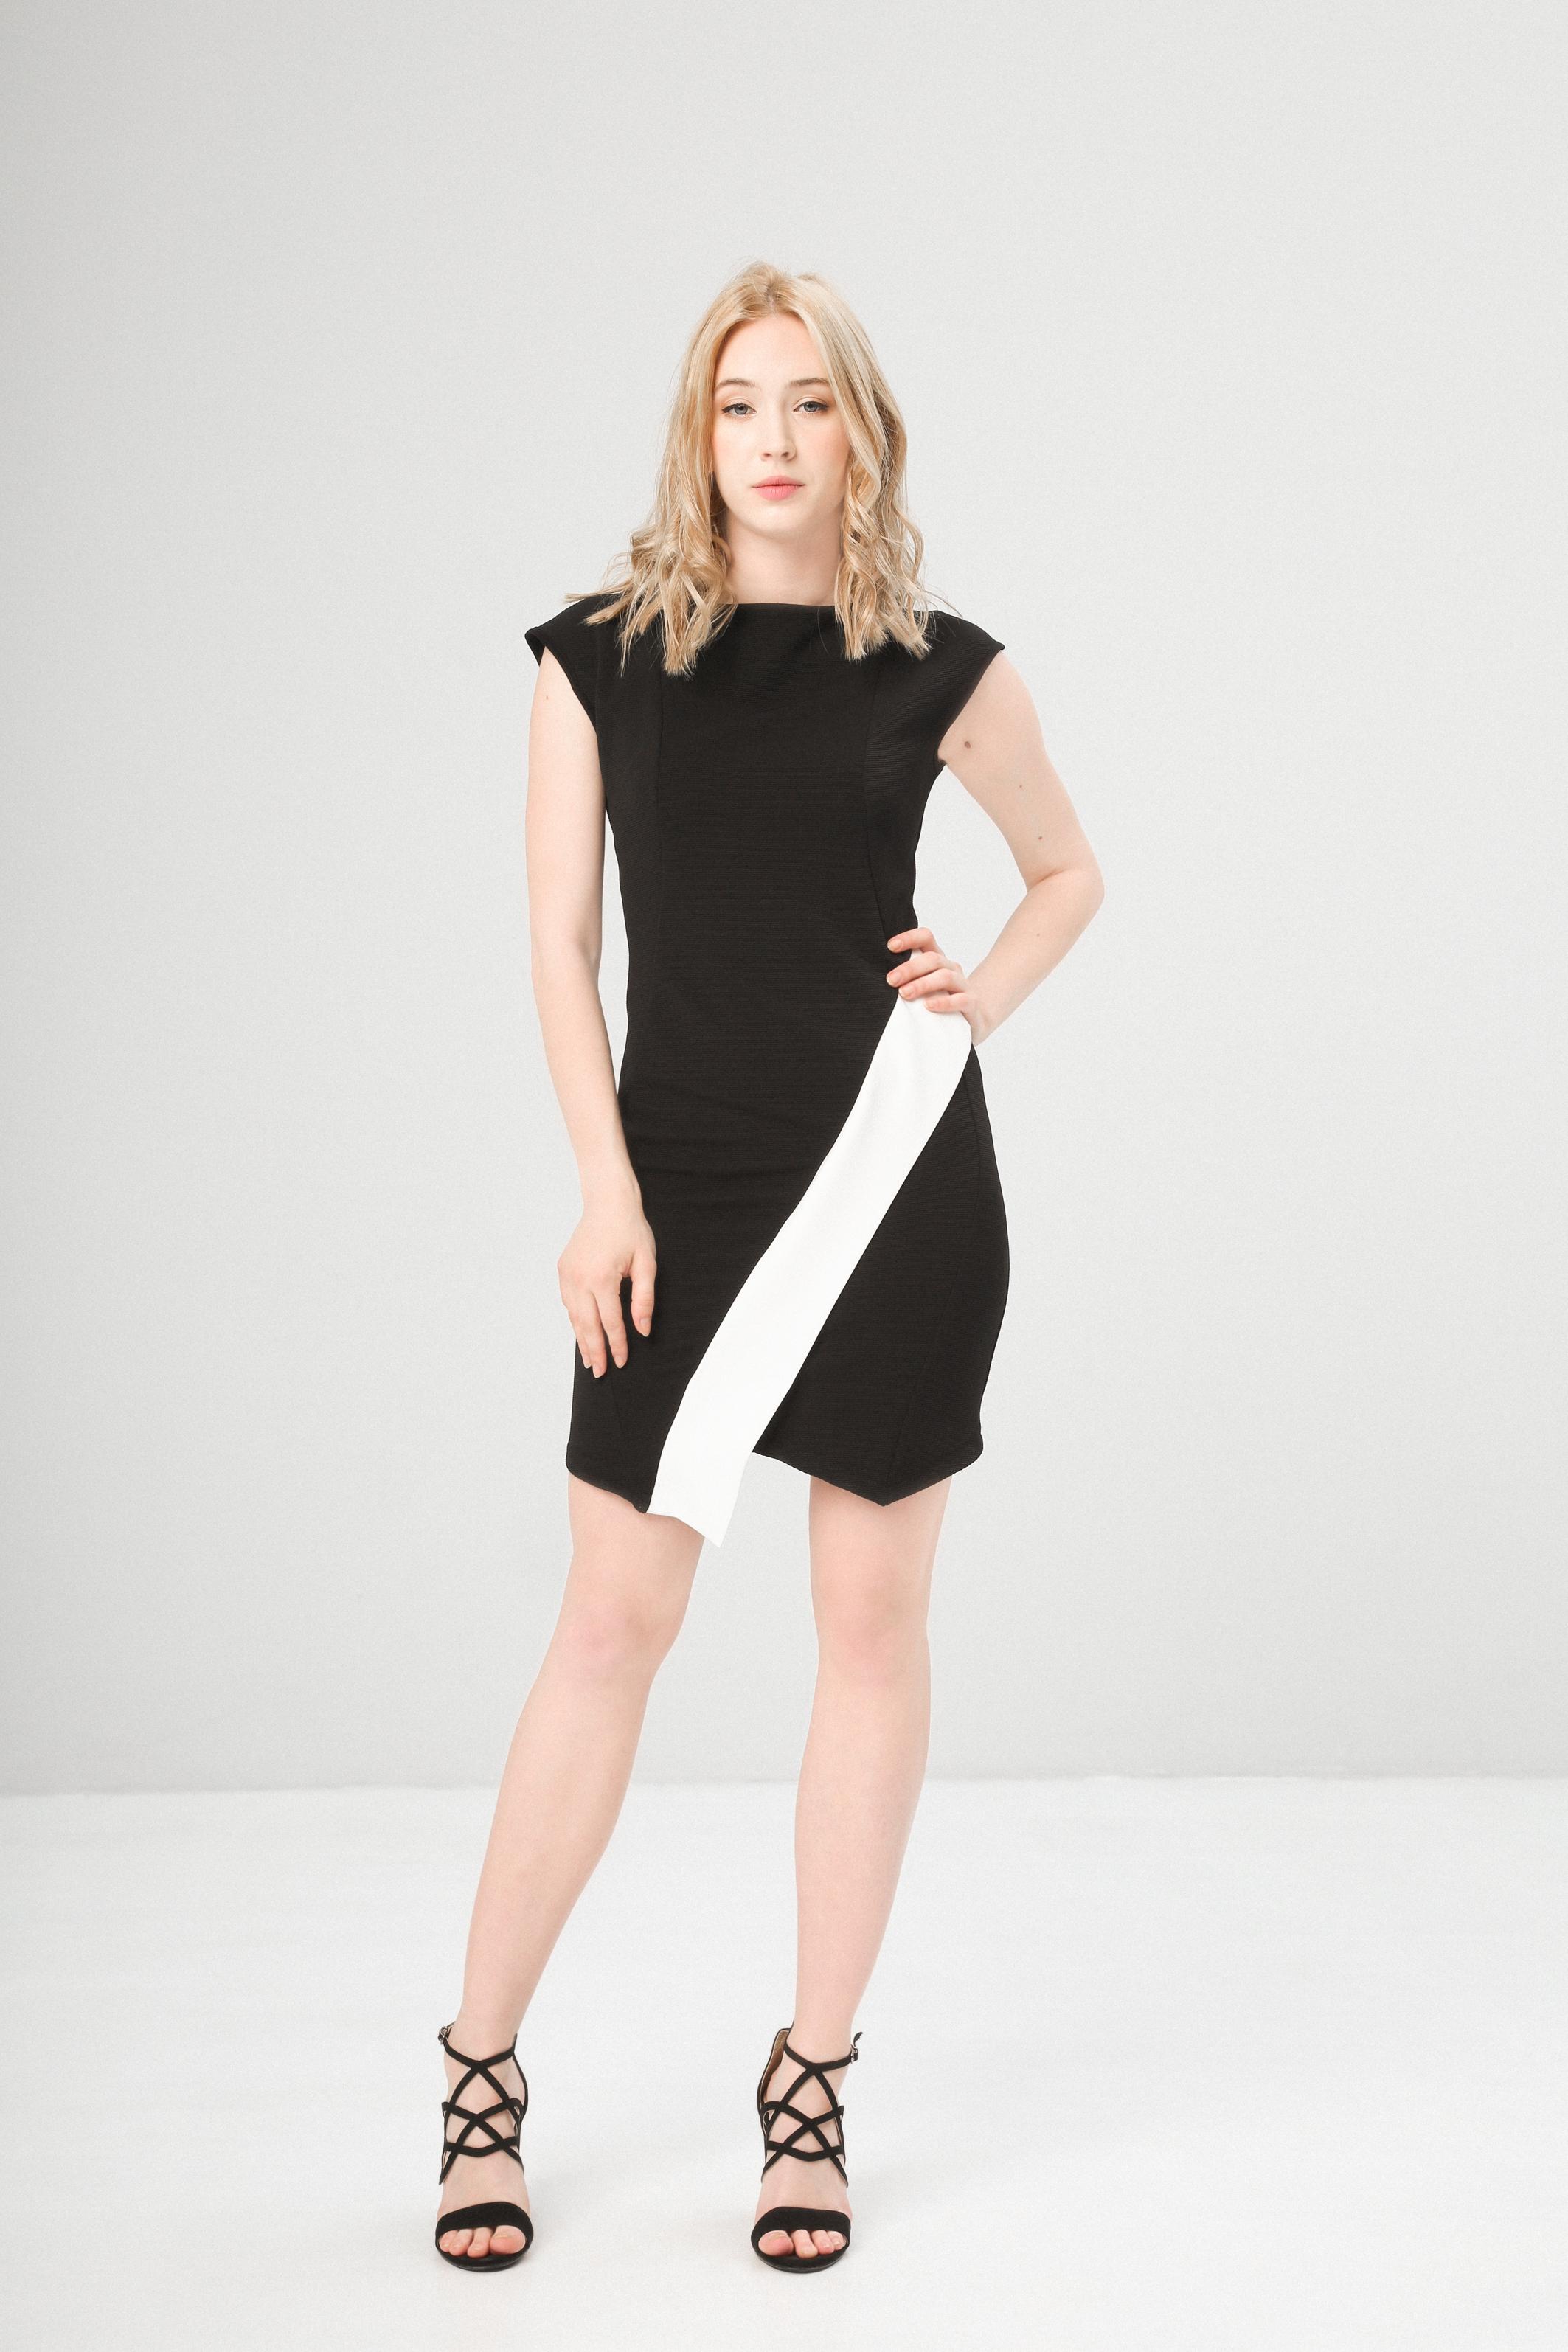 Fontana 2.0 DULINA Damen Kleid Cocktailkleid Sommerkleid Schwarz | eBay